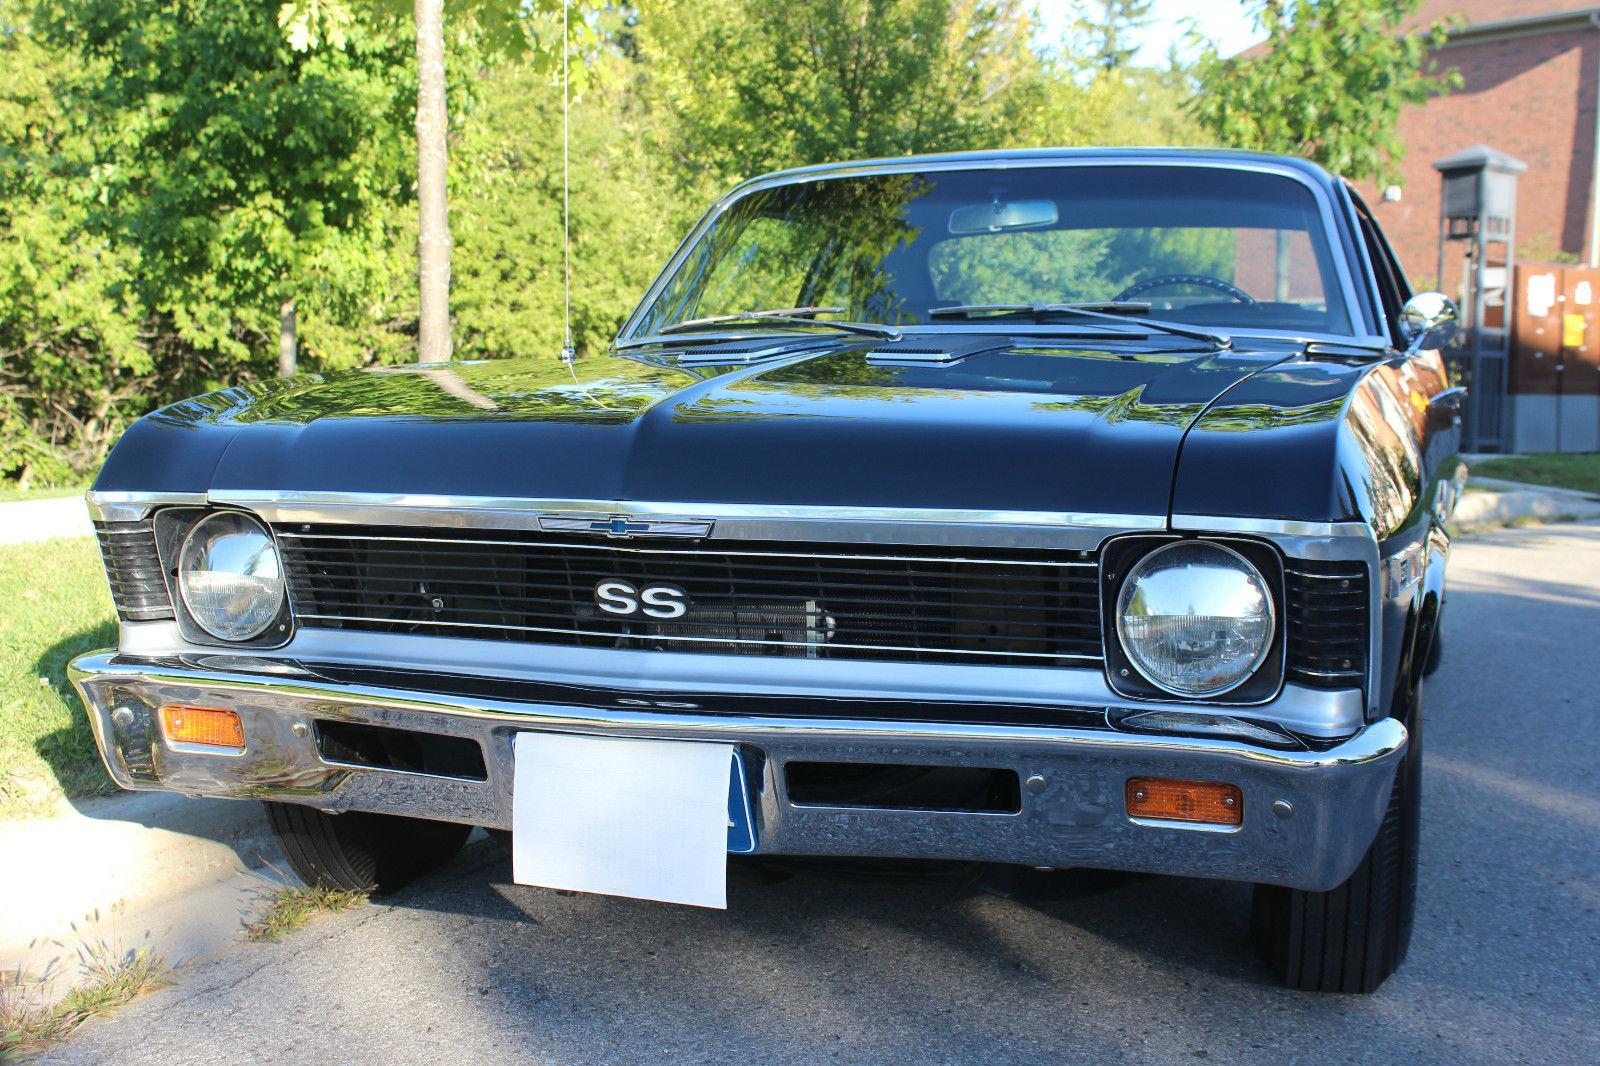 1969 Chevy Nova Ss Black On Black Documented